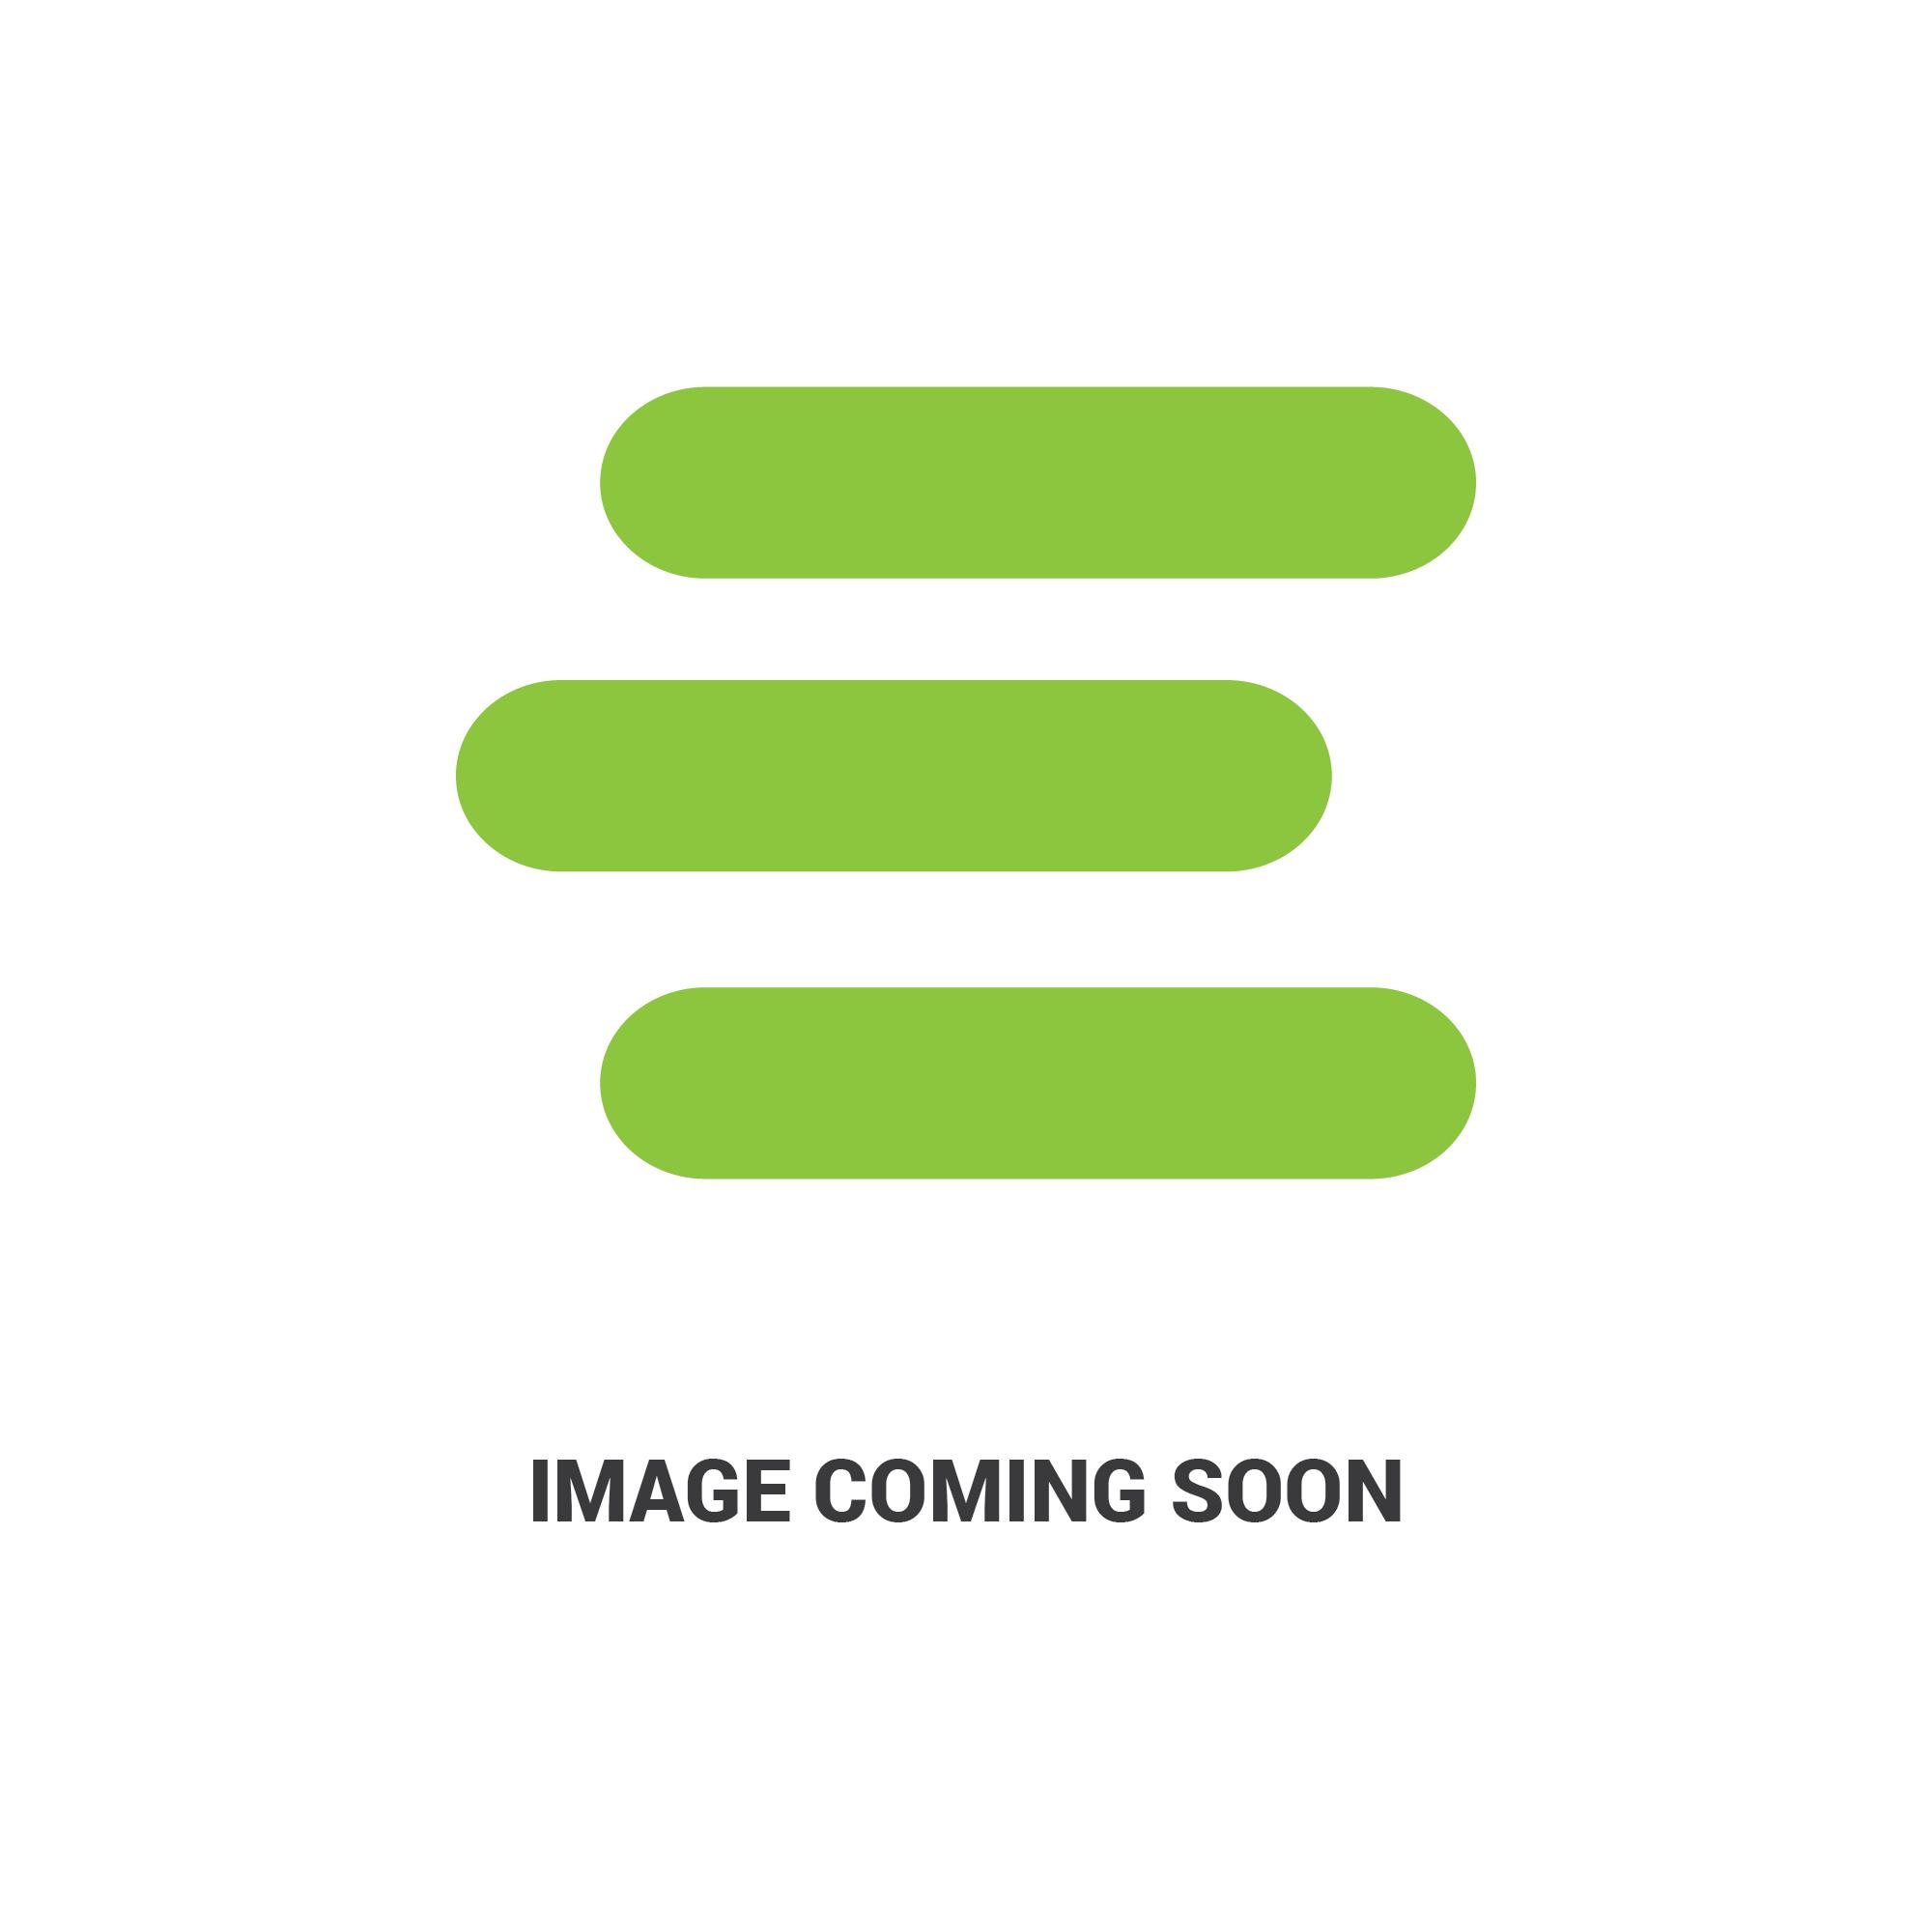 E-CC199941430_1.jpg